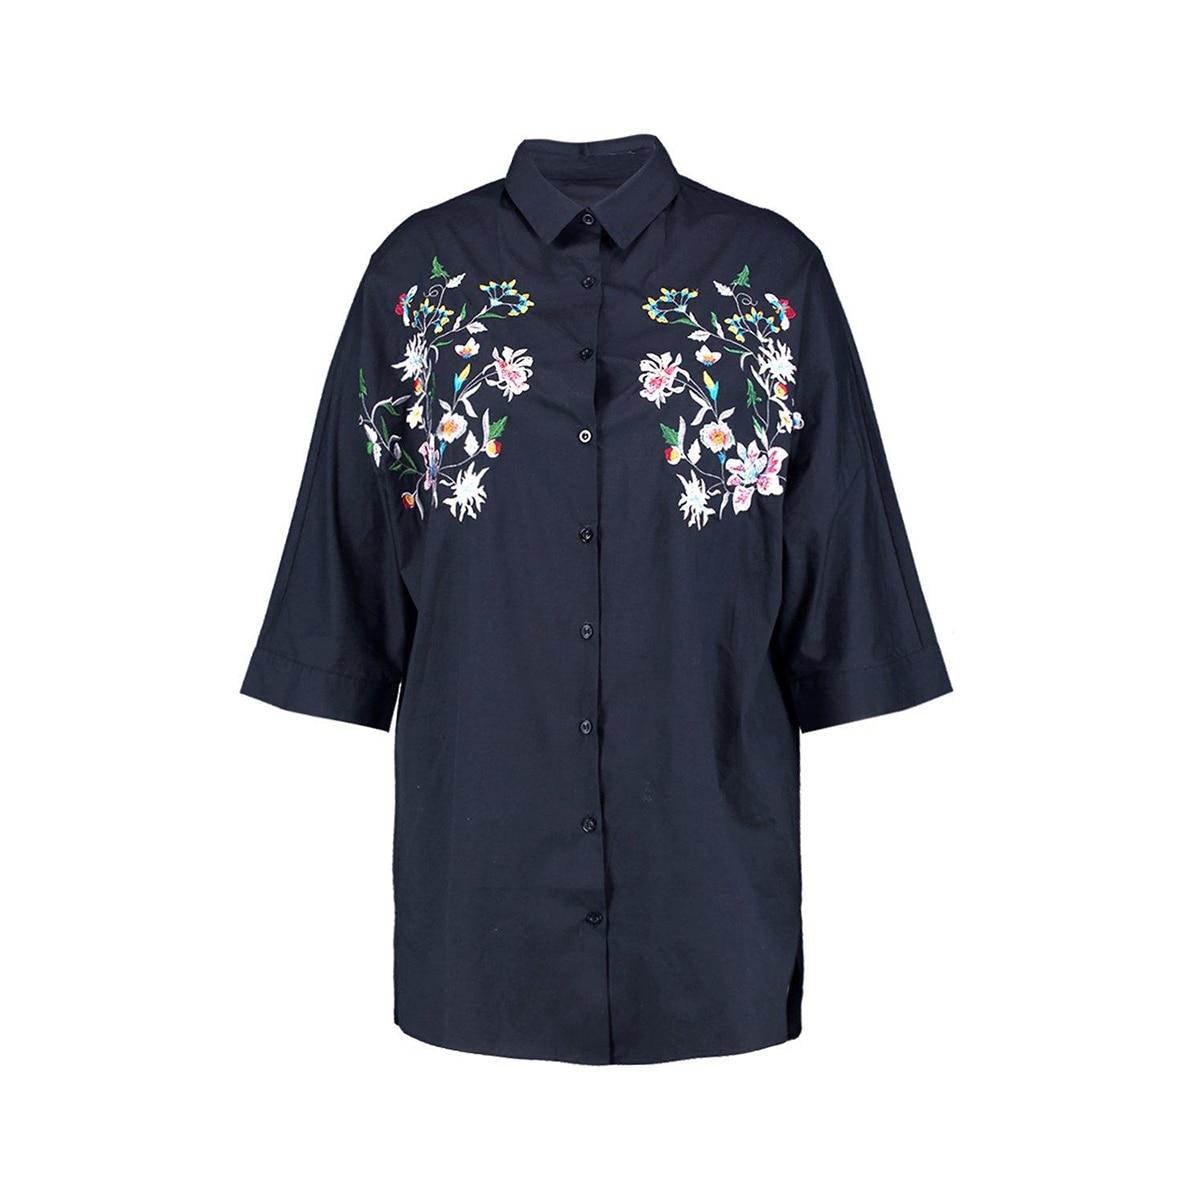 Kissmilk Women Plus Size Foral Embroidery Turn Down Collar Shirt Nine Quarter Sleeve Solid Basic Shirt Large Size Casual Shirt 5